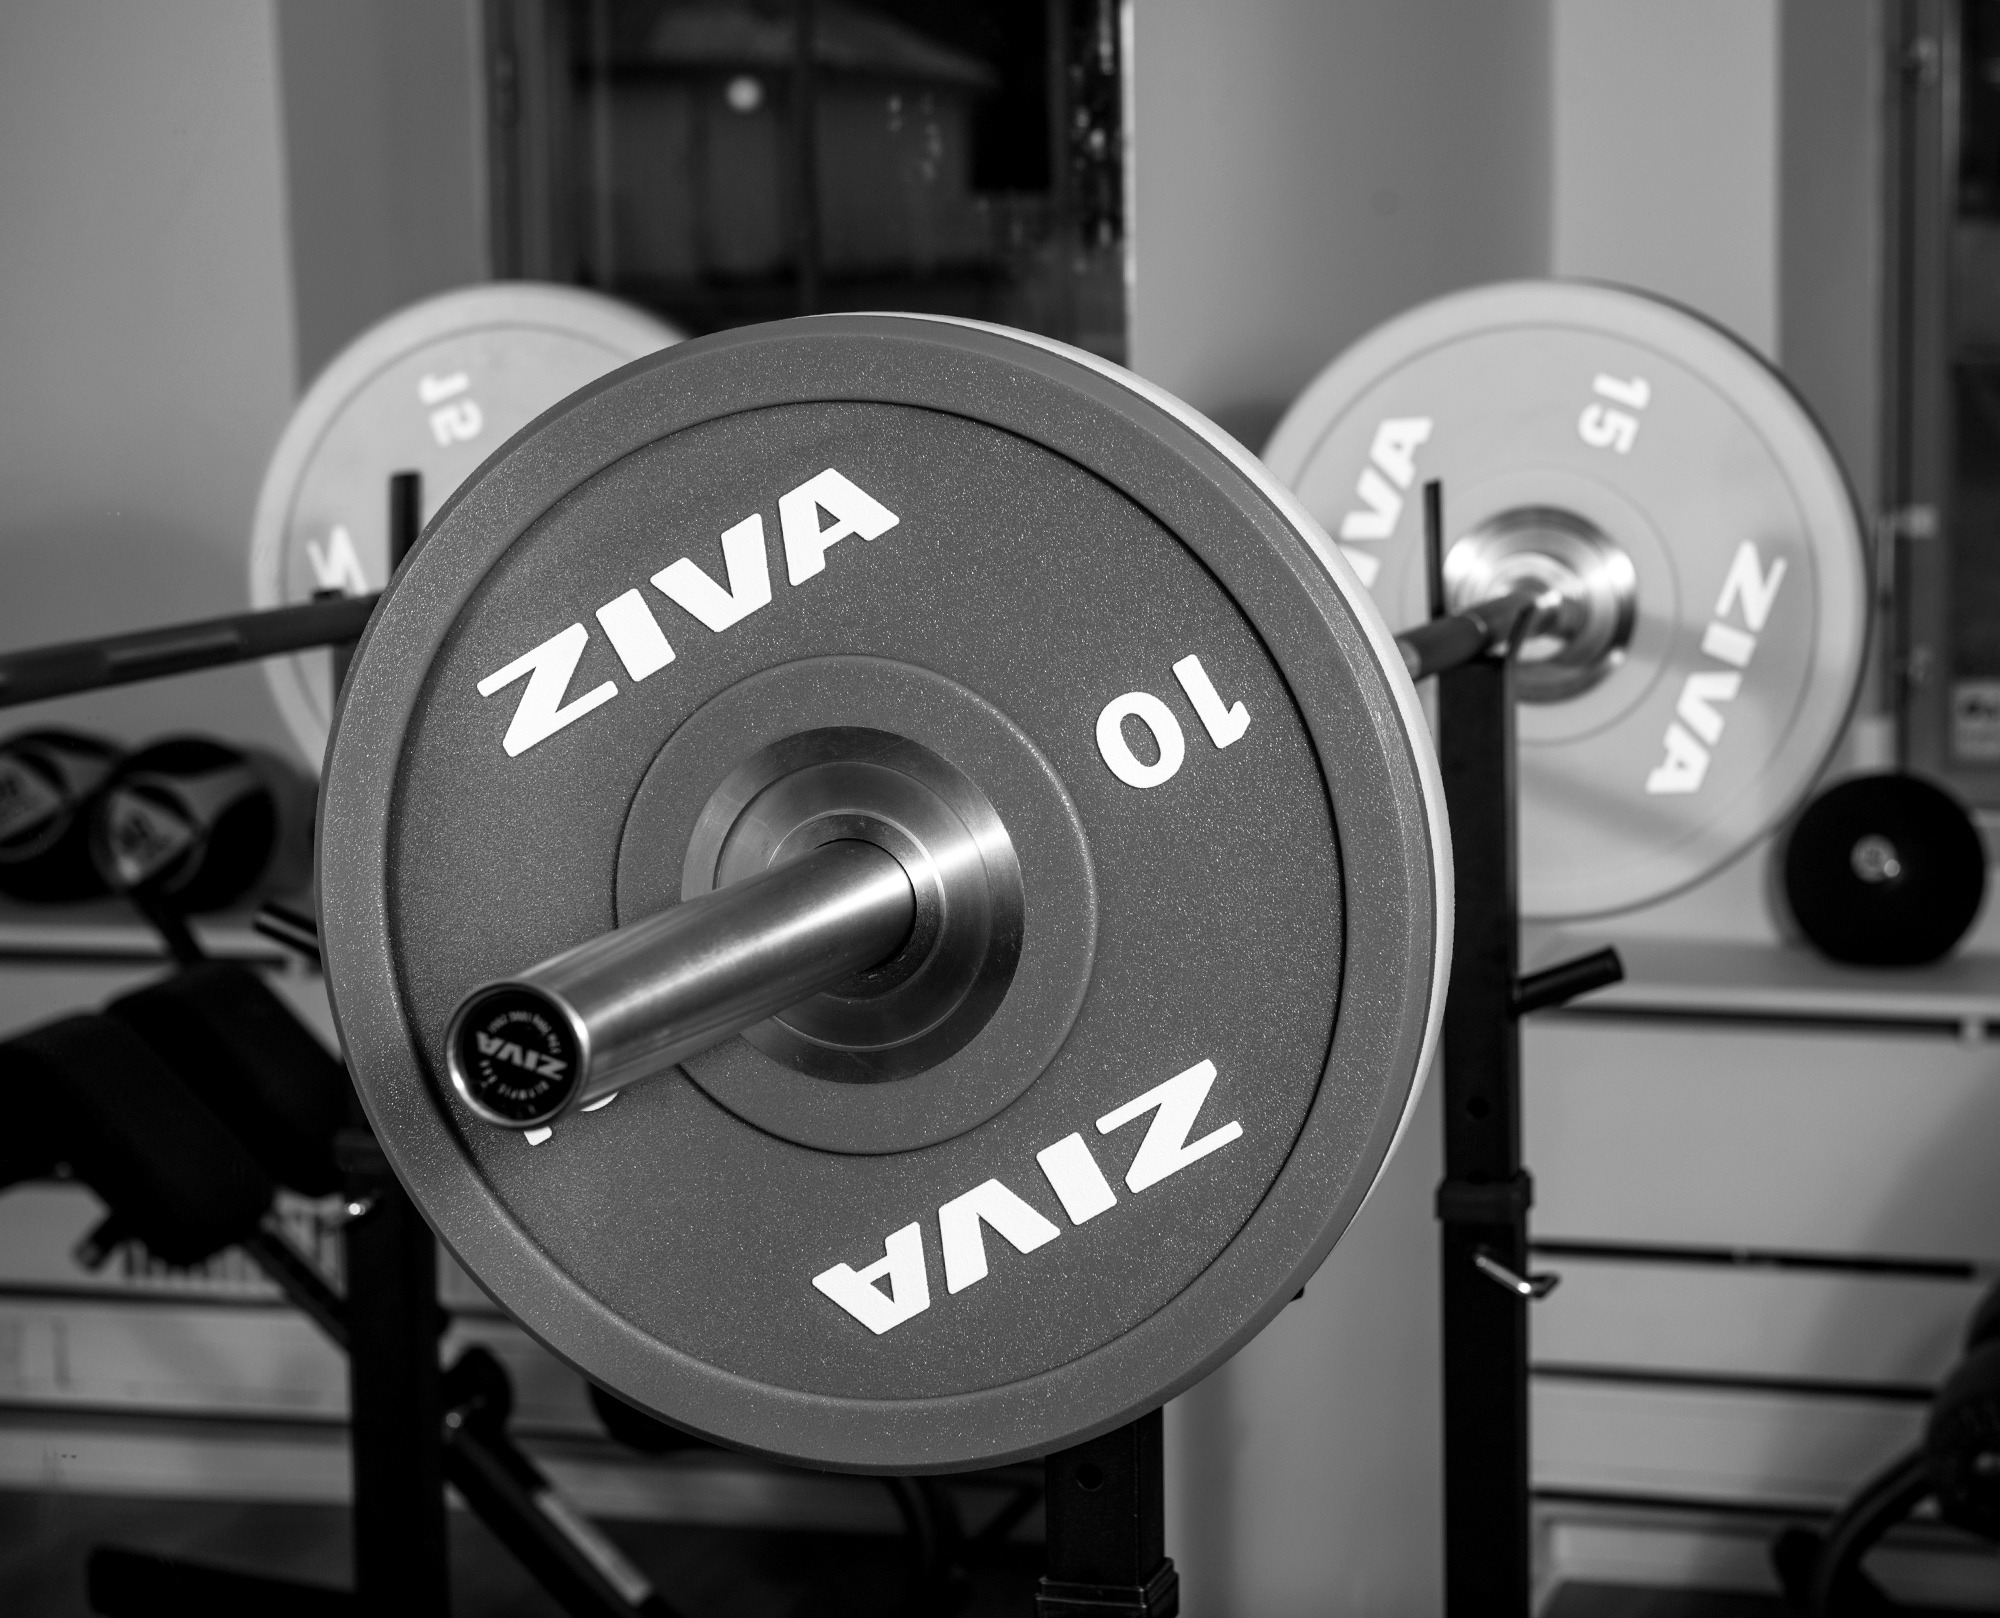 Træningscenter hos Sportsfysioterapien